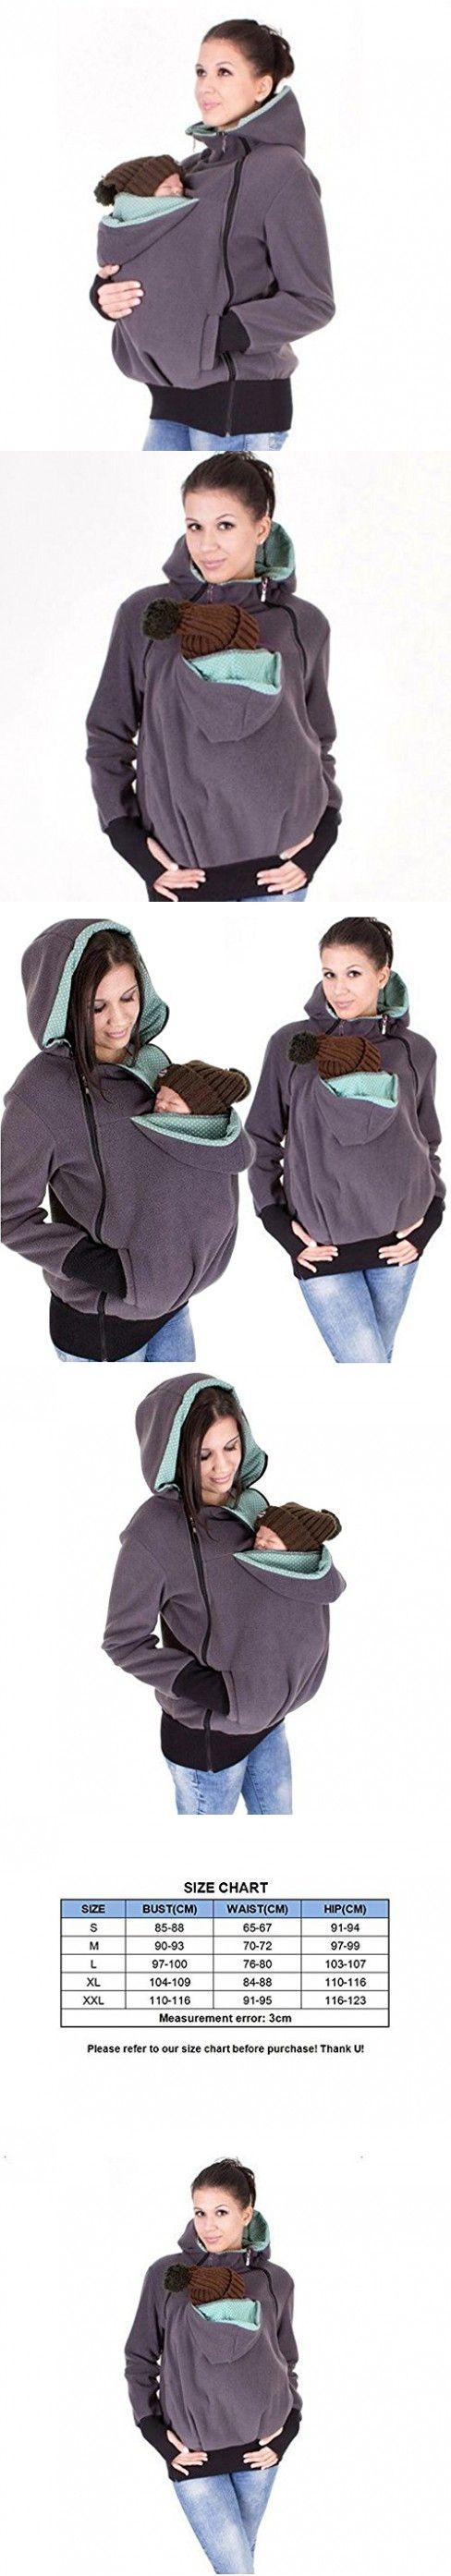 Women 3 in 1 Hoodie Maternity Outerwear Coat Kangaroo Jacket Baby Carrier (M, Grey)